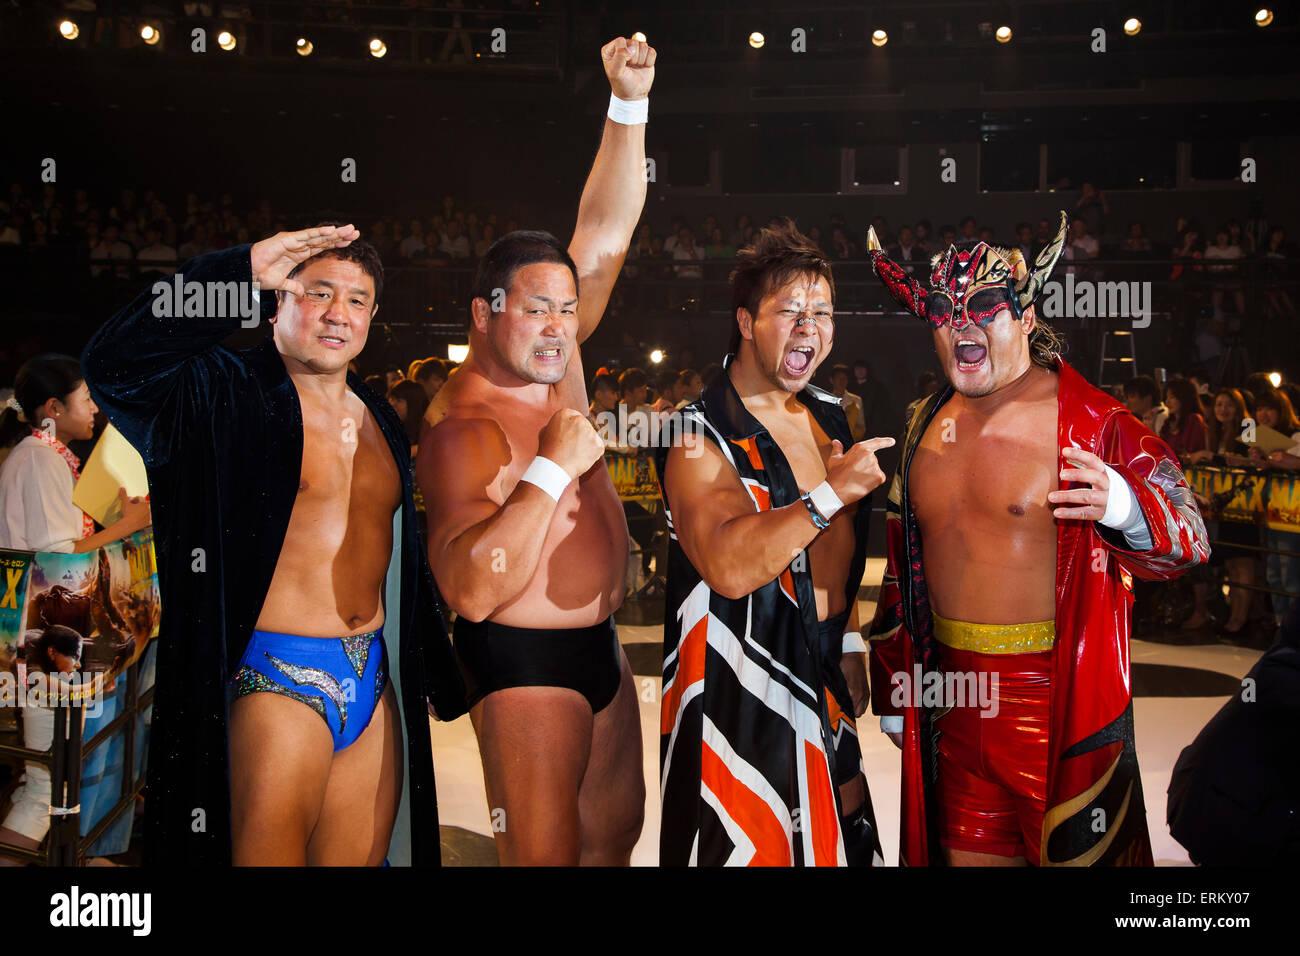 Pro Wrestlers Yuji Nagata, Manabu Nakanishi, Satoshi Kojima and Hiroyoshi Tenzan pose for the cameras during the - Stock Image